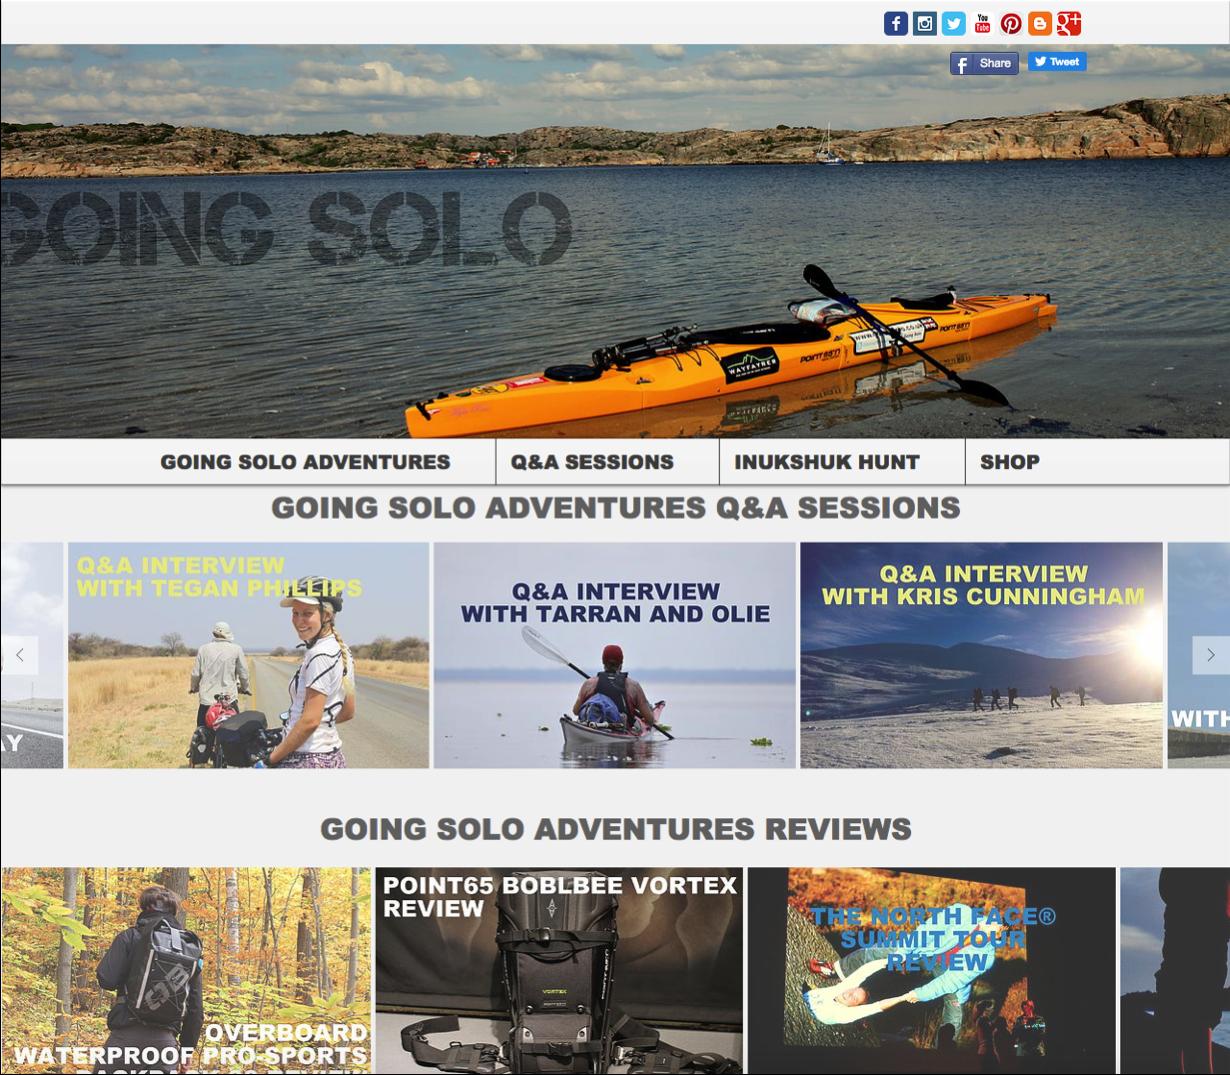 Going Solo Adventures